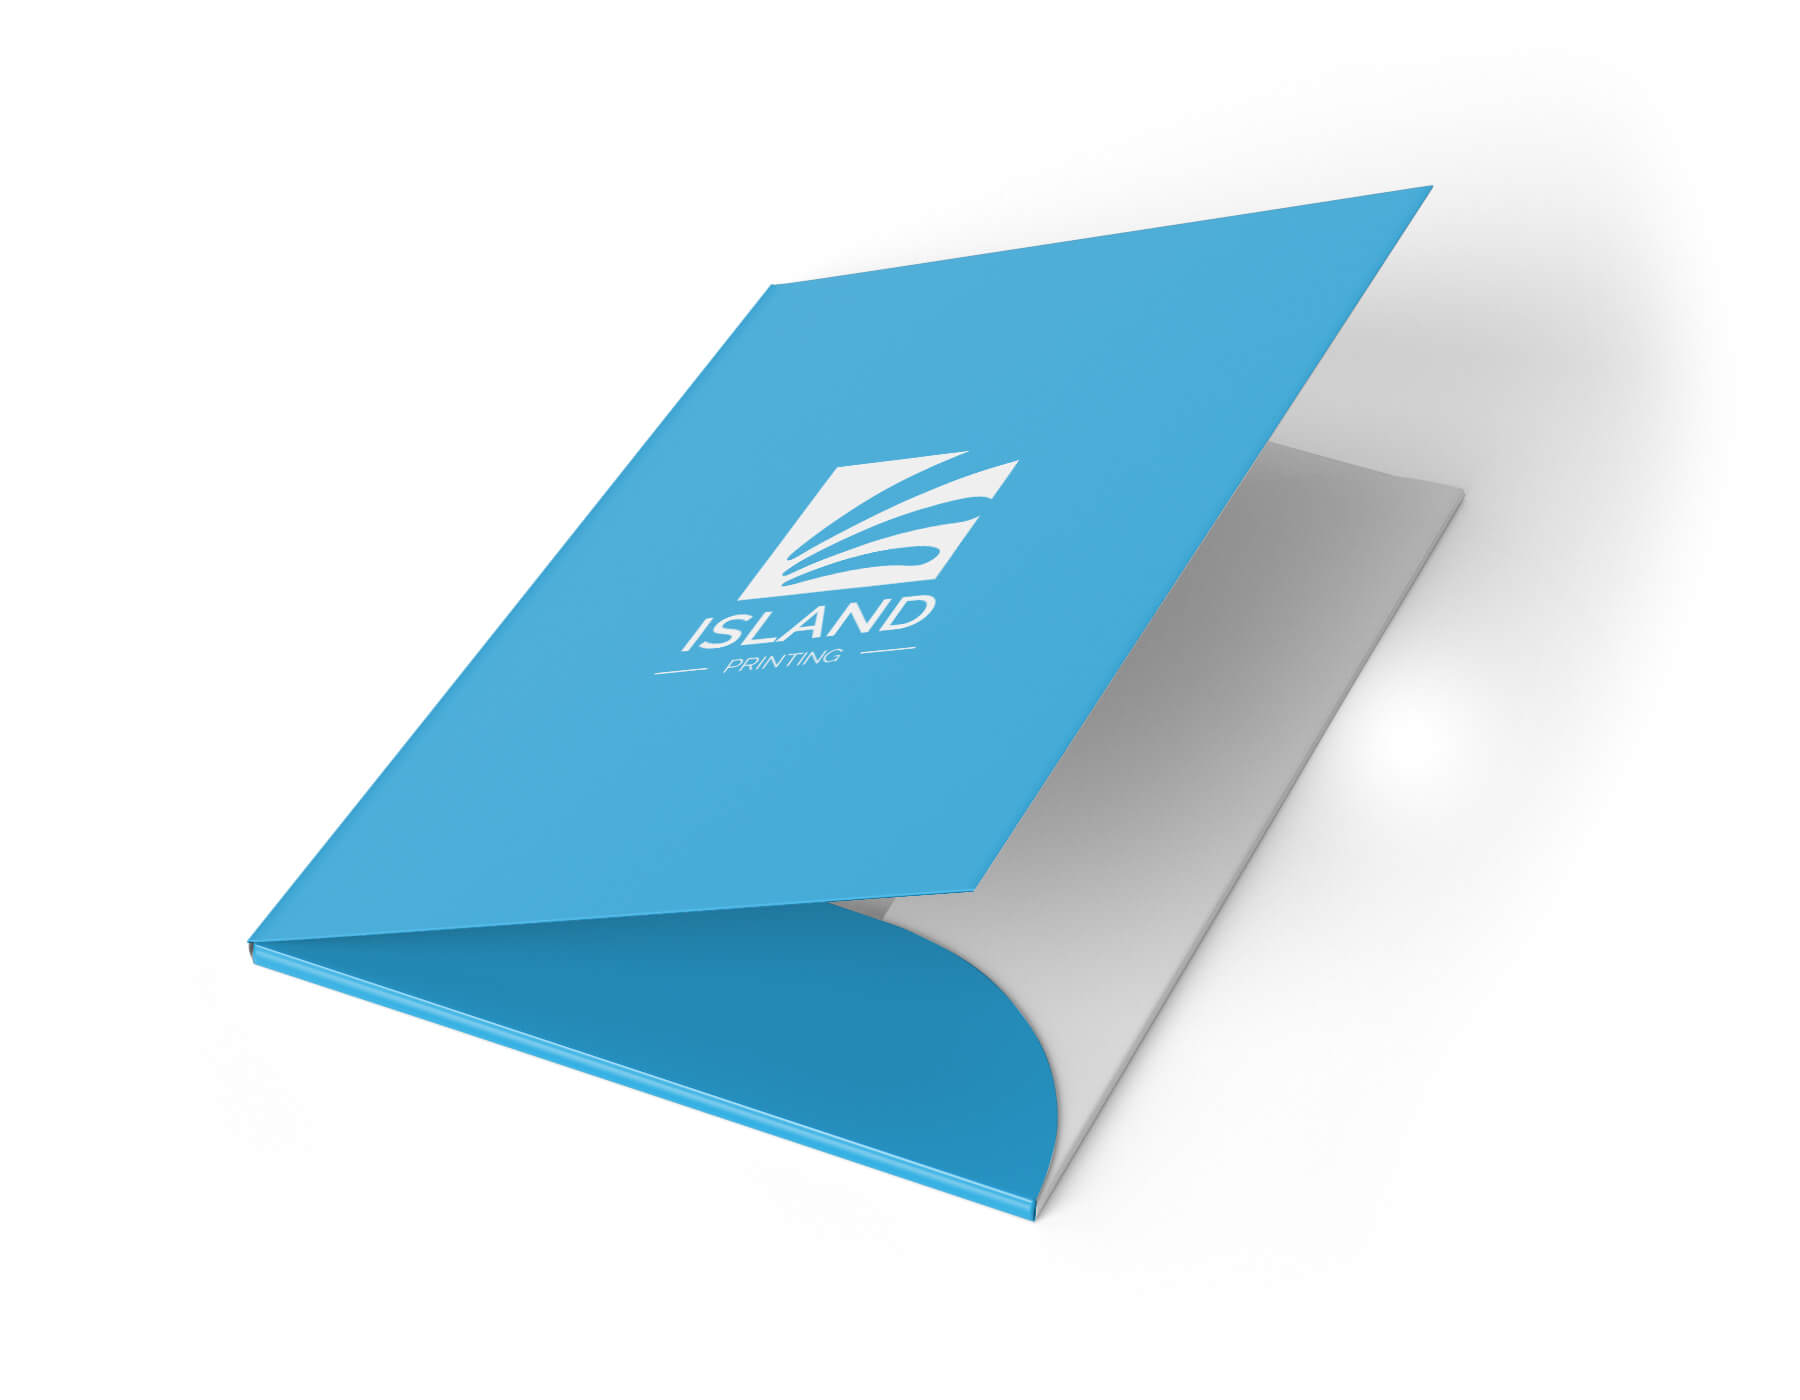 A printed presentation folder